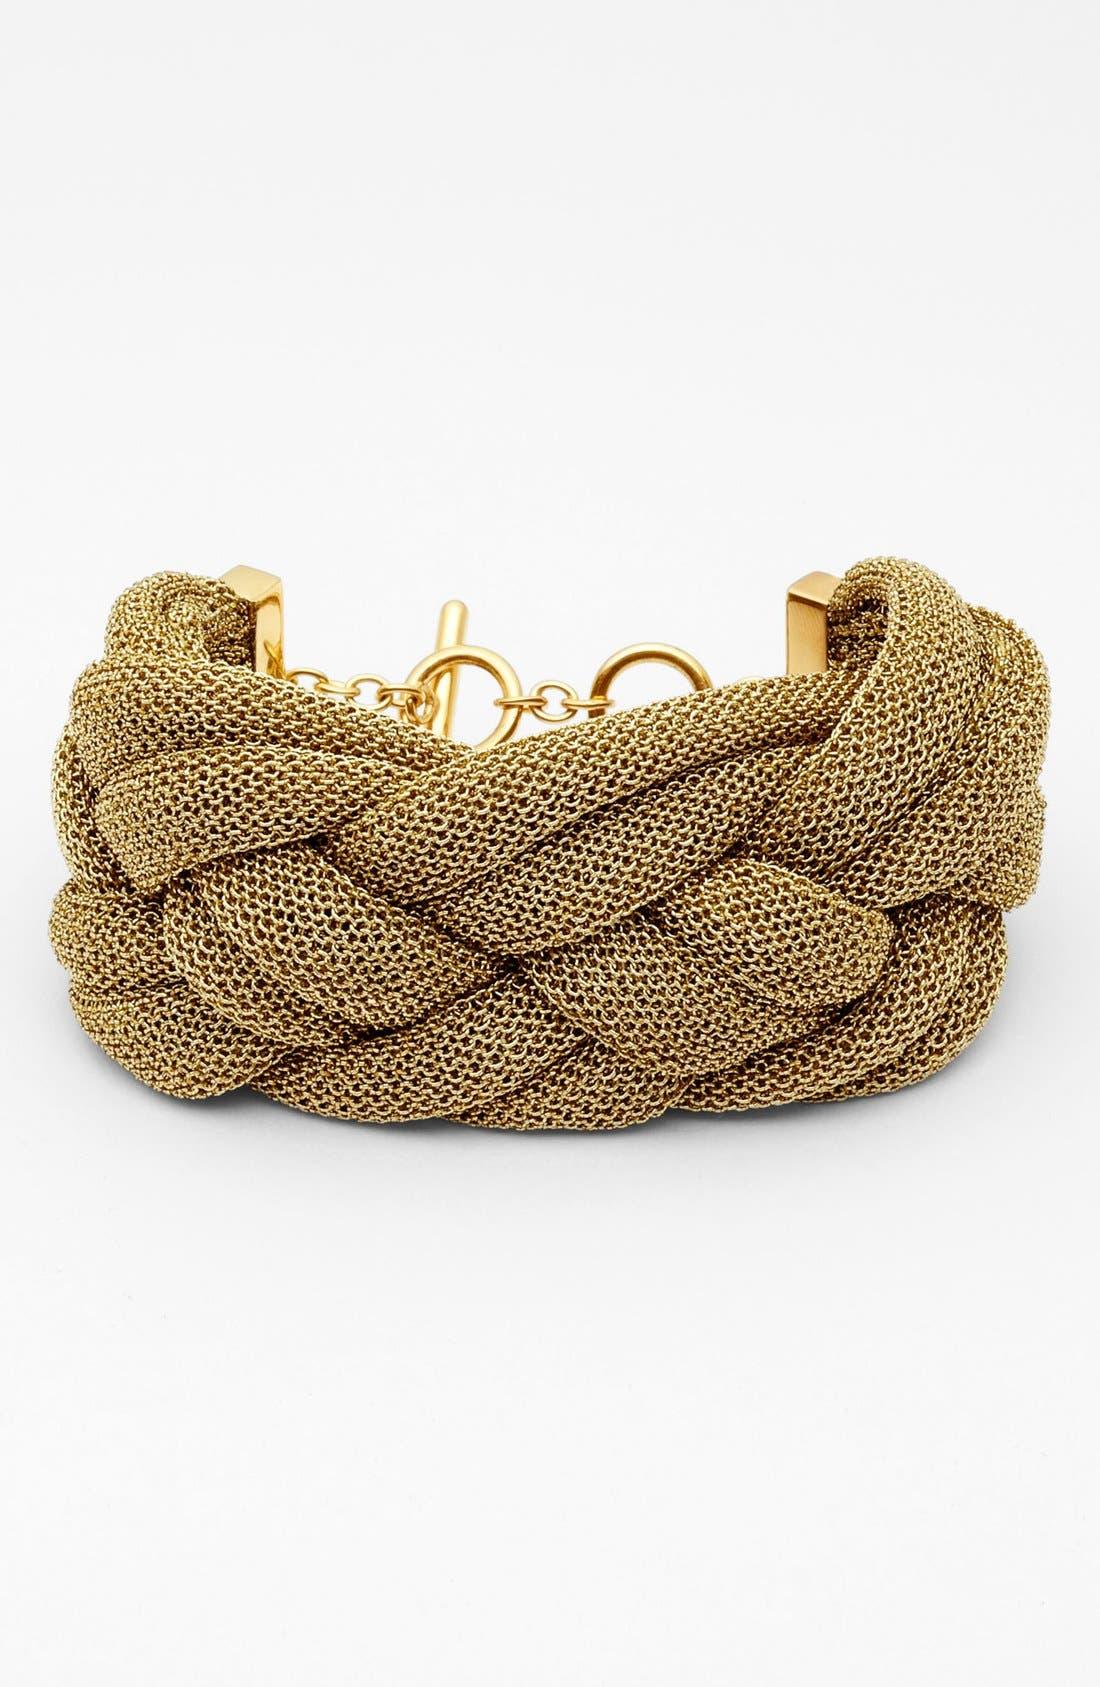 Alternate Image 1 Selected - Adami & Martucci 'Mesh' Medium Braided Bracelet